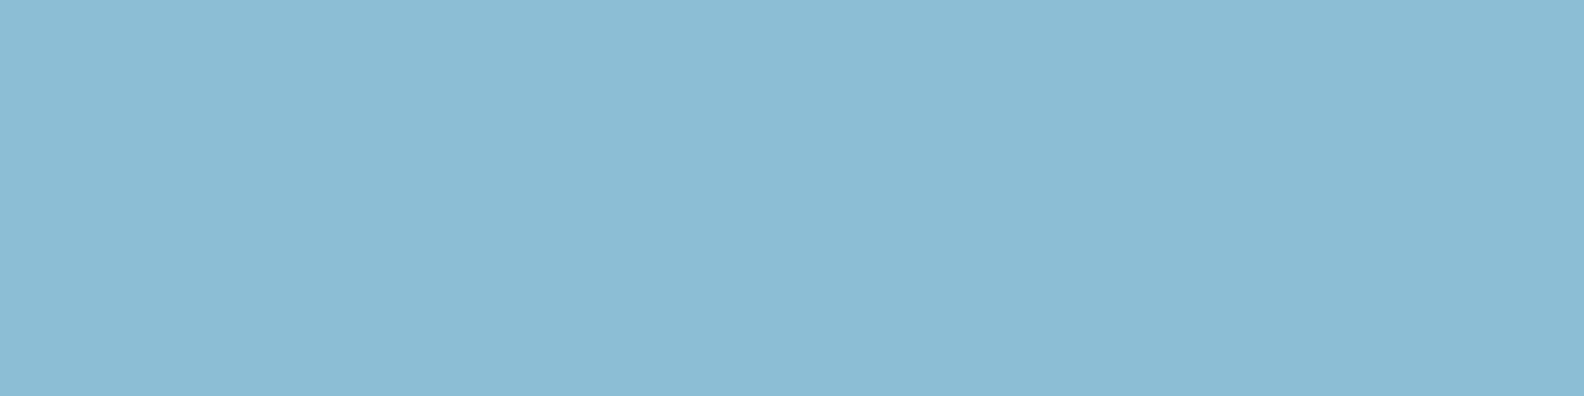 1584x396 Dark Sky Blue Solid Color Background